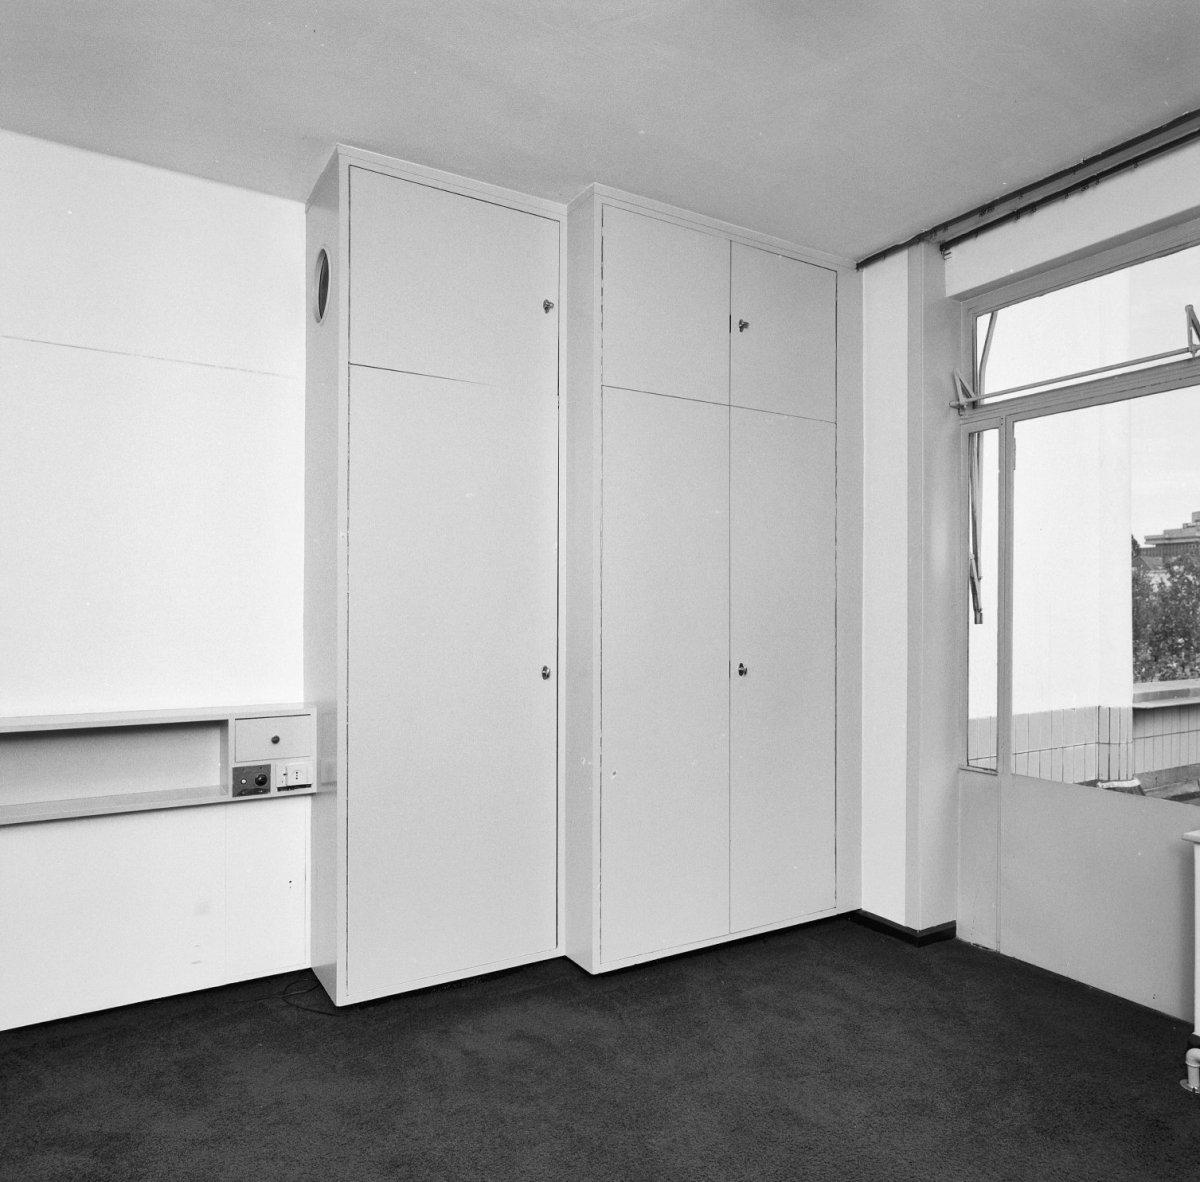 . tweede verdieping, slaapkamer van de oudste dochter met vaste kast ...